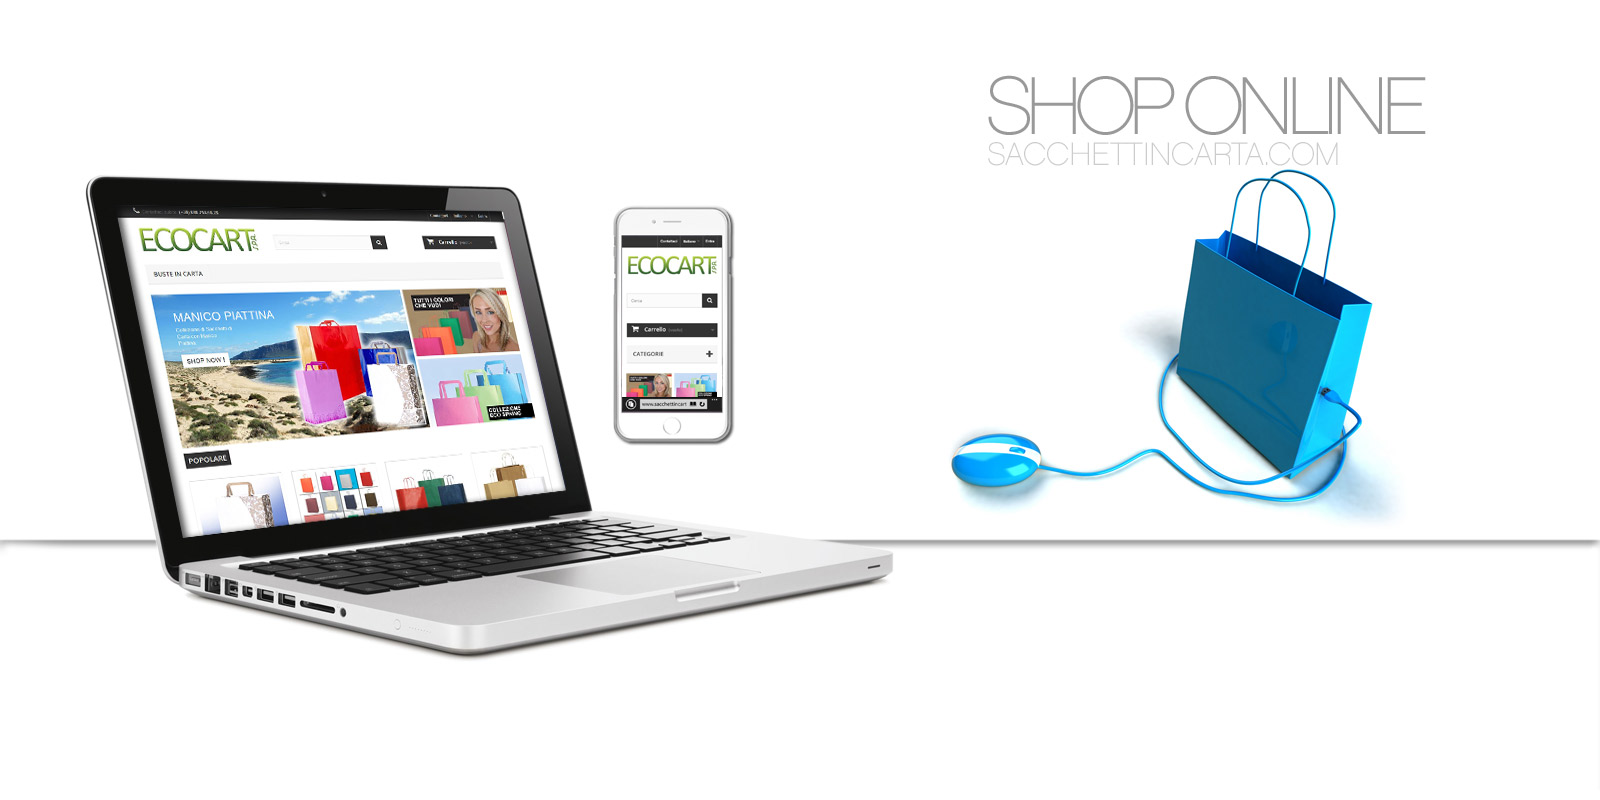 Shop Online sacchettincarta.com Ecommerce by Ecocart Spa